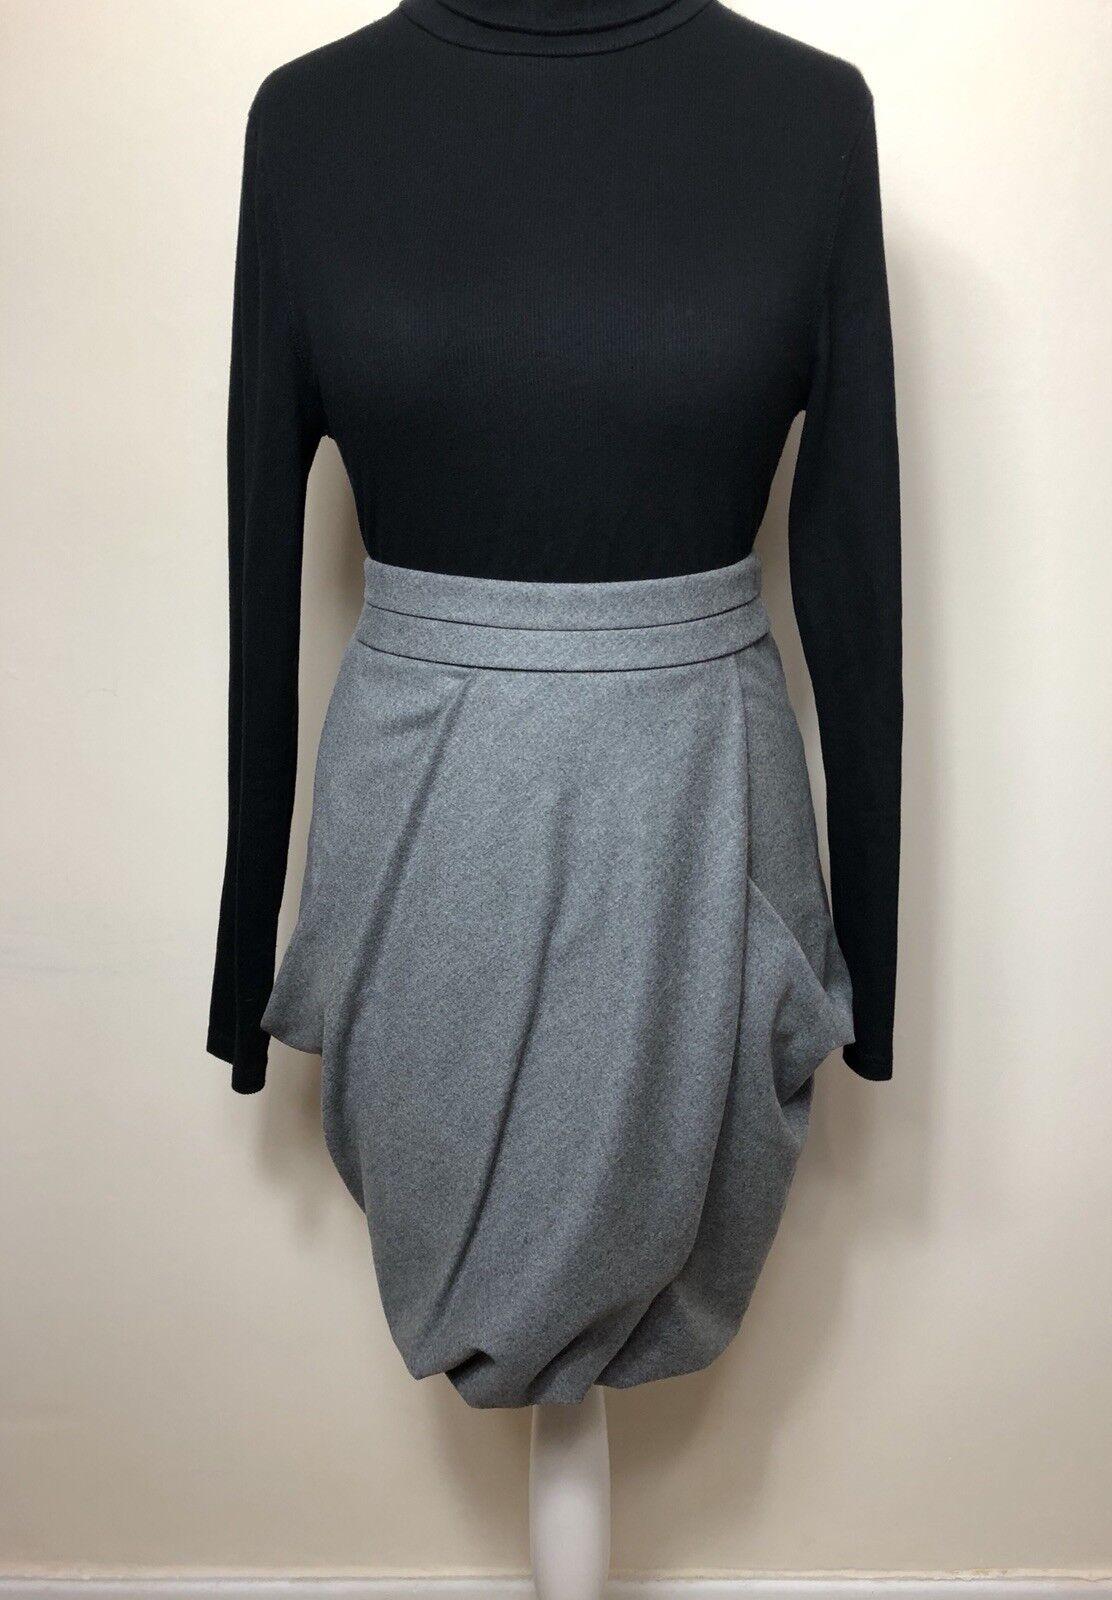 Ladies ARMANI Size 44 IT Grey Skirt Wool Angora Blend Draped Tulip Pleated